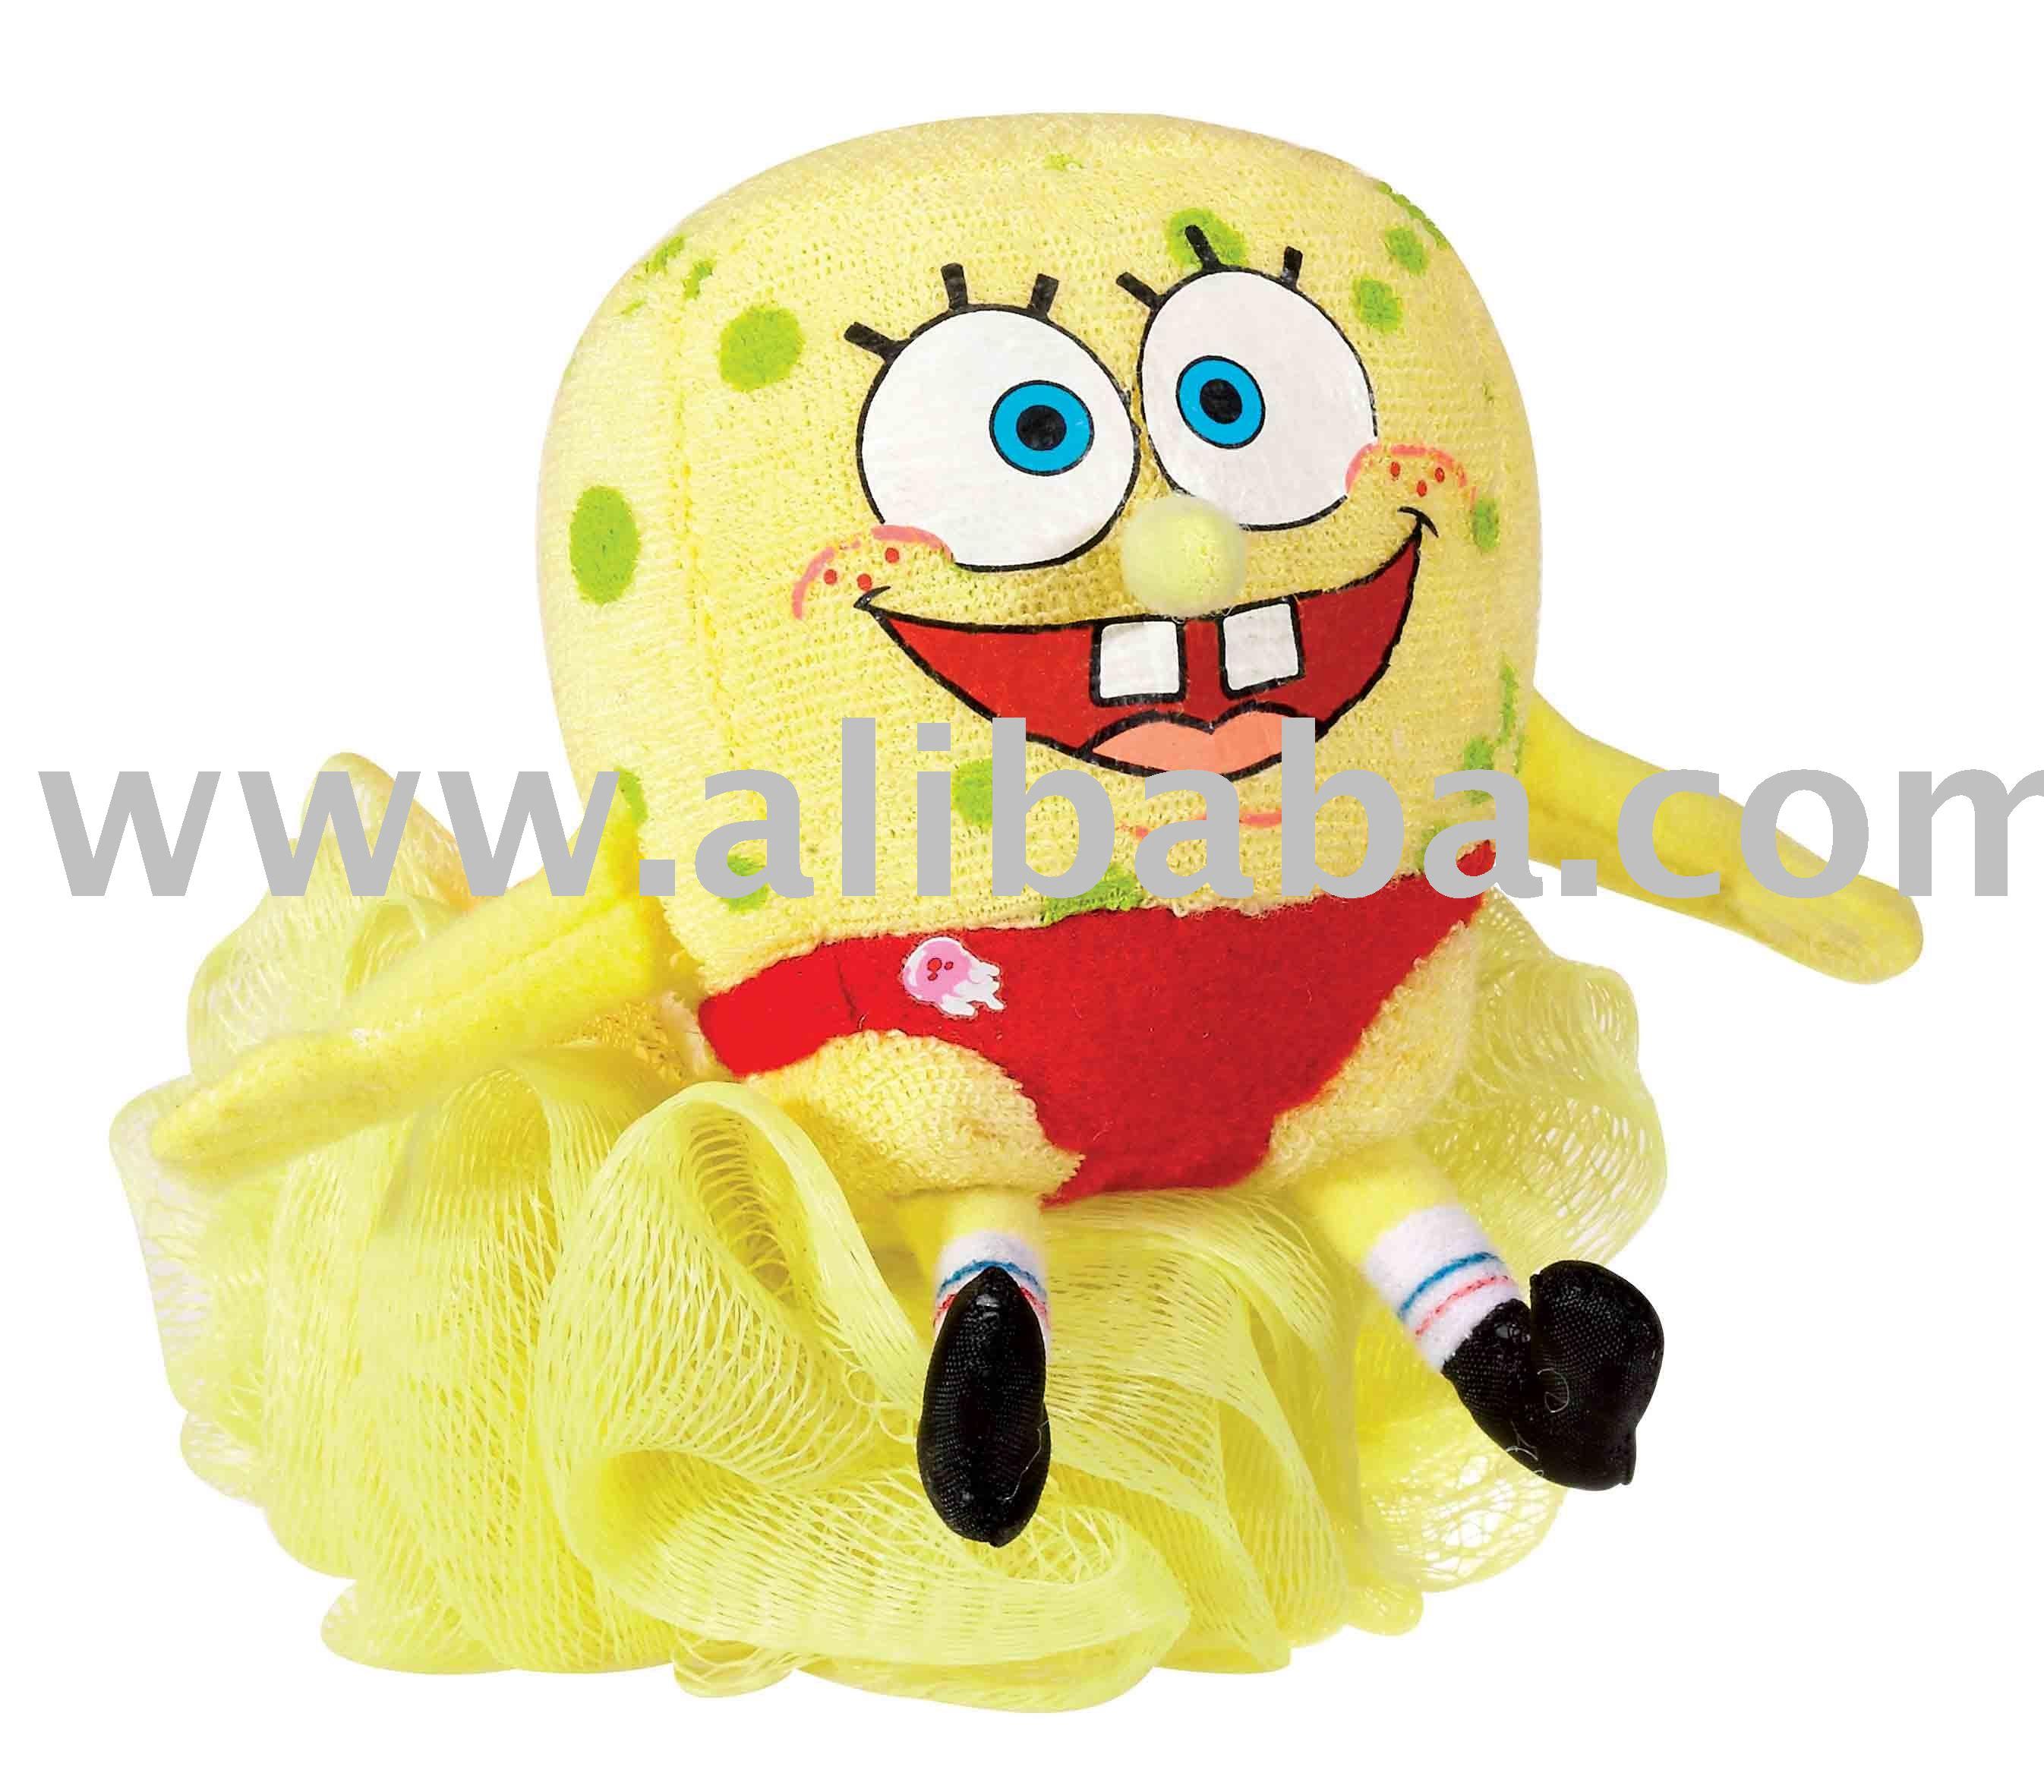 Spongebob squarepants bathroom accessories - Bathroom Accessories By Angeer Great Selection Of Bath S